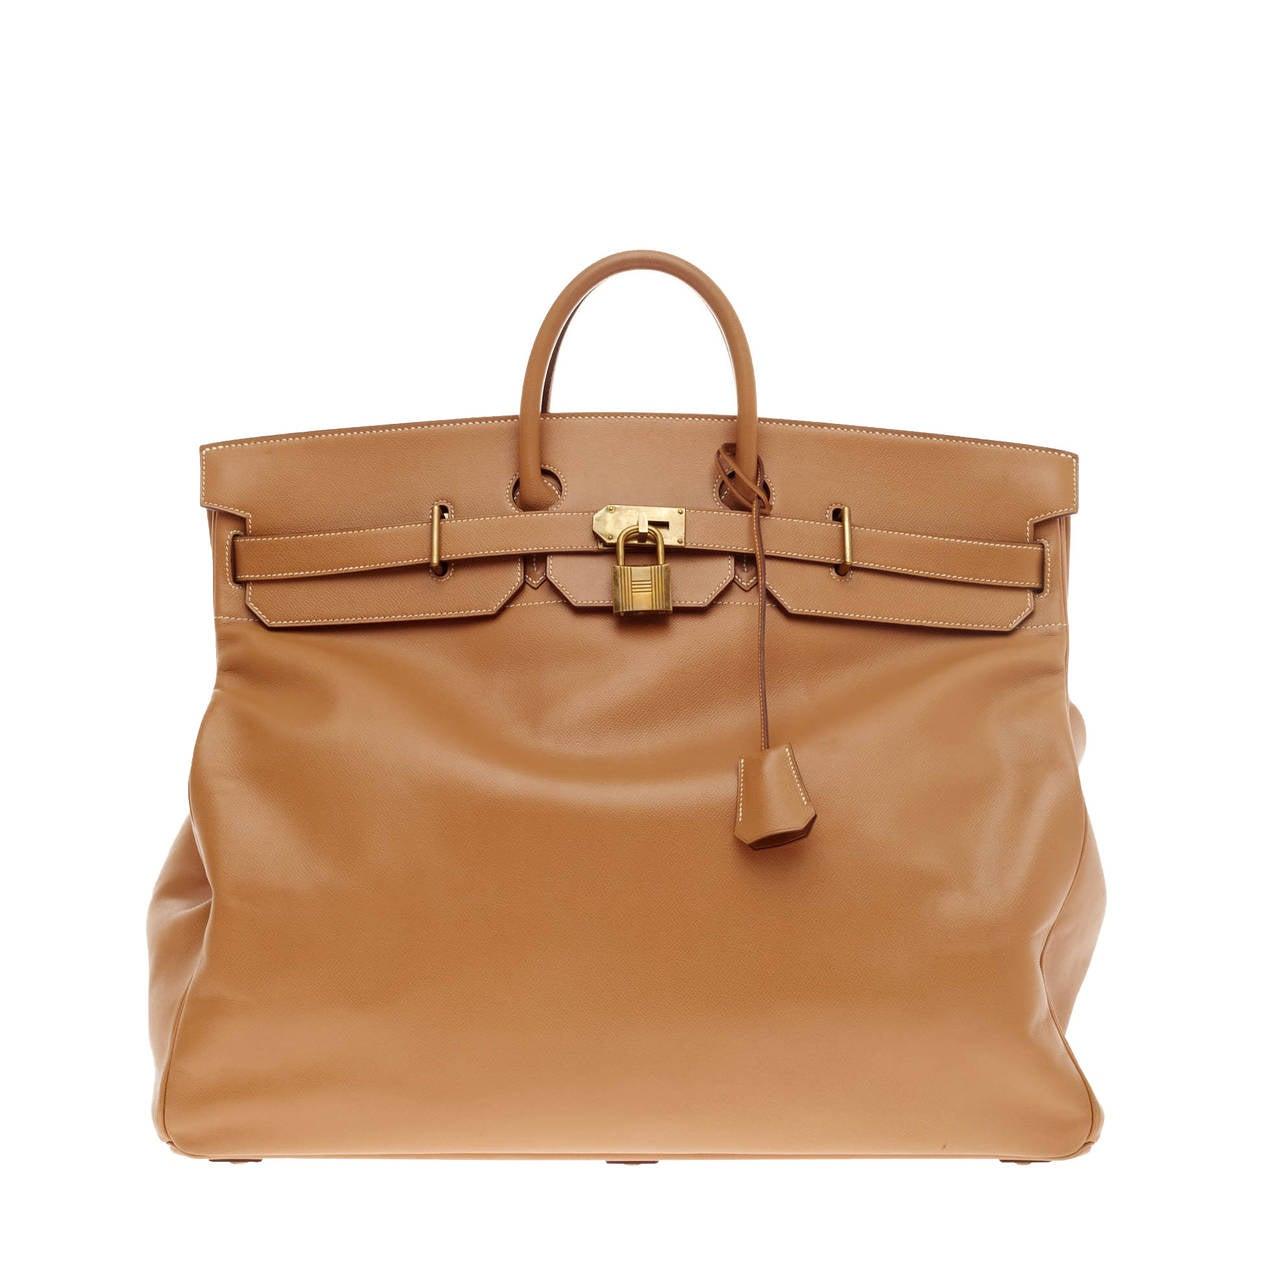 Hermes Birkin HAC Gold Veau Courchevel leather with Brass Hardware ... a6b42820e8e97